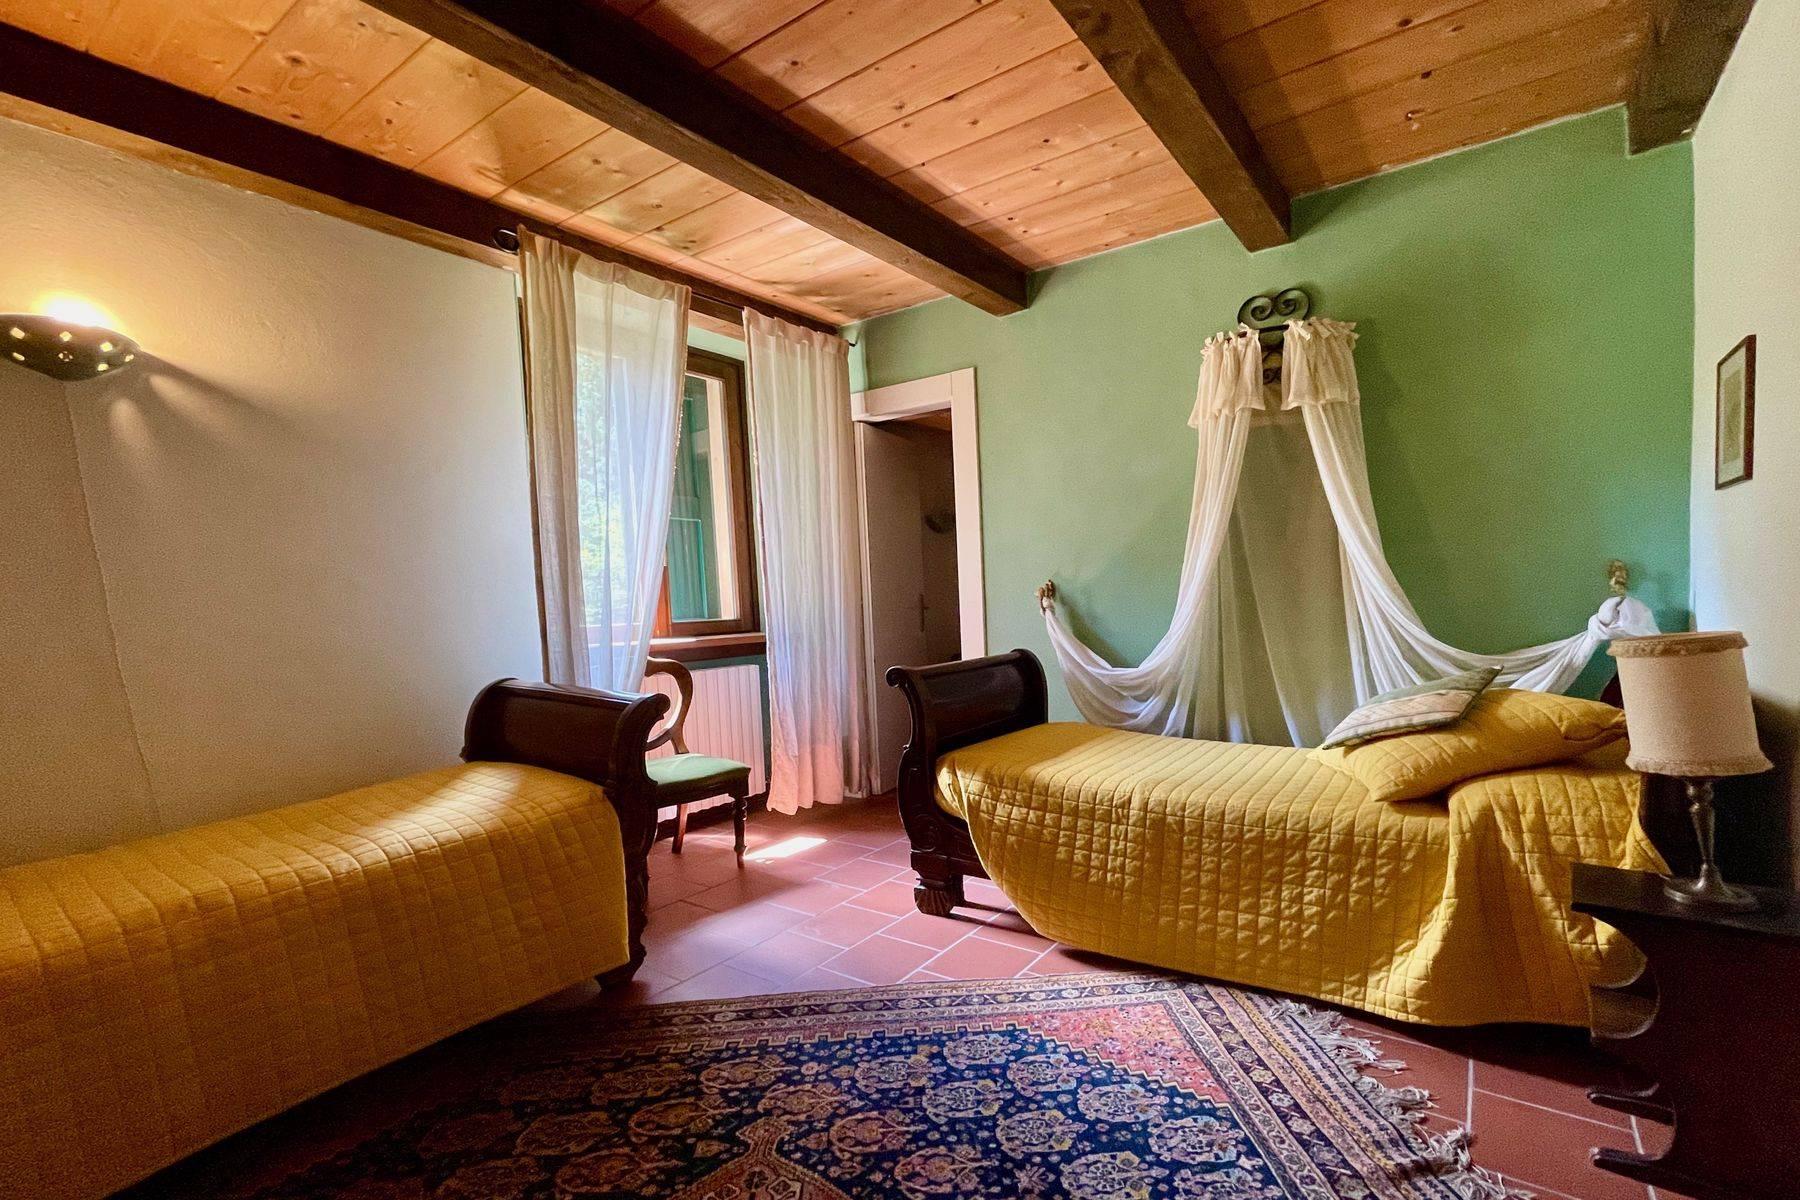 Rustico in Vendita a Verona: 5 locali, 350 mq - Foto 17